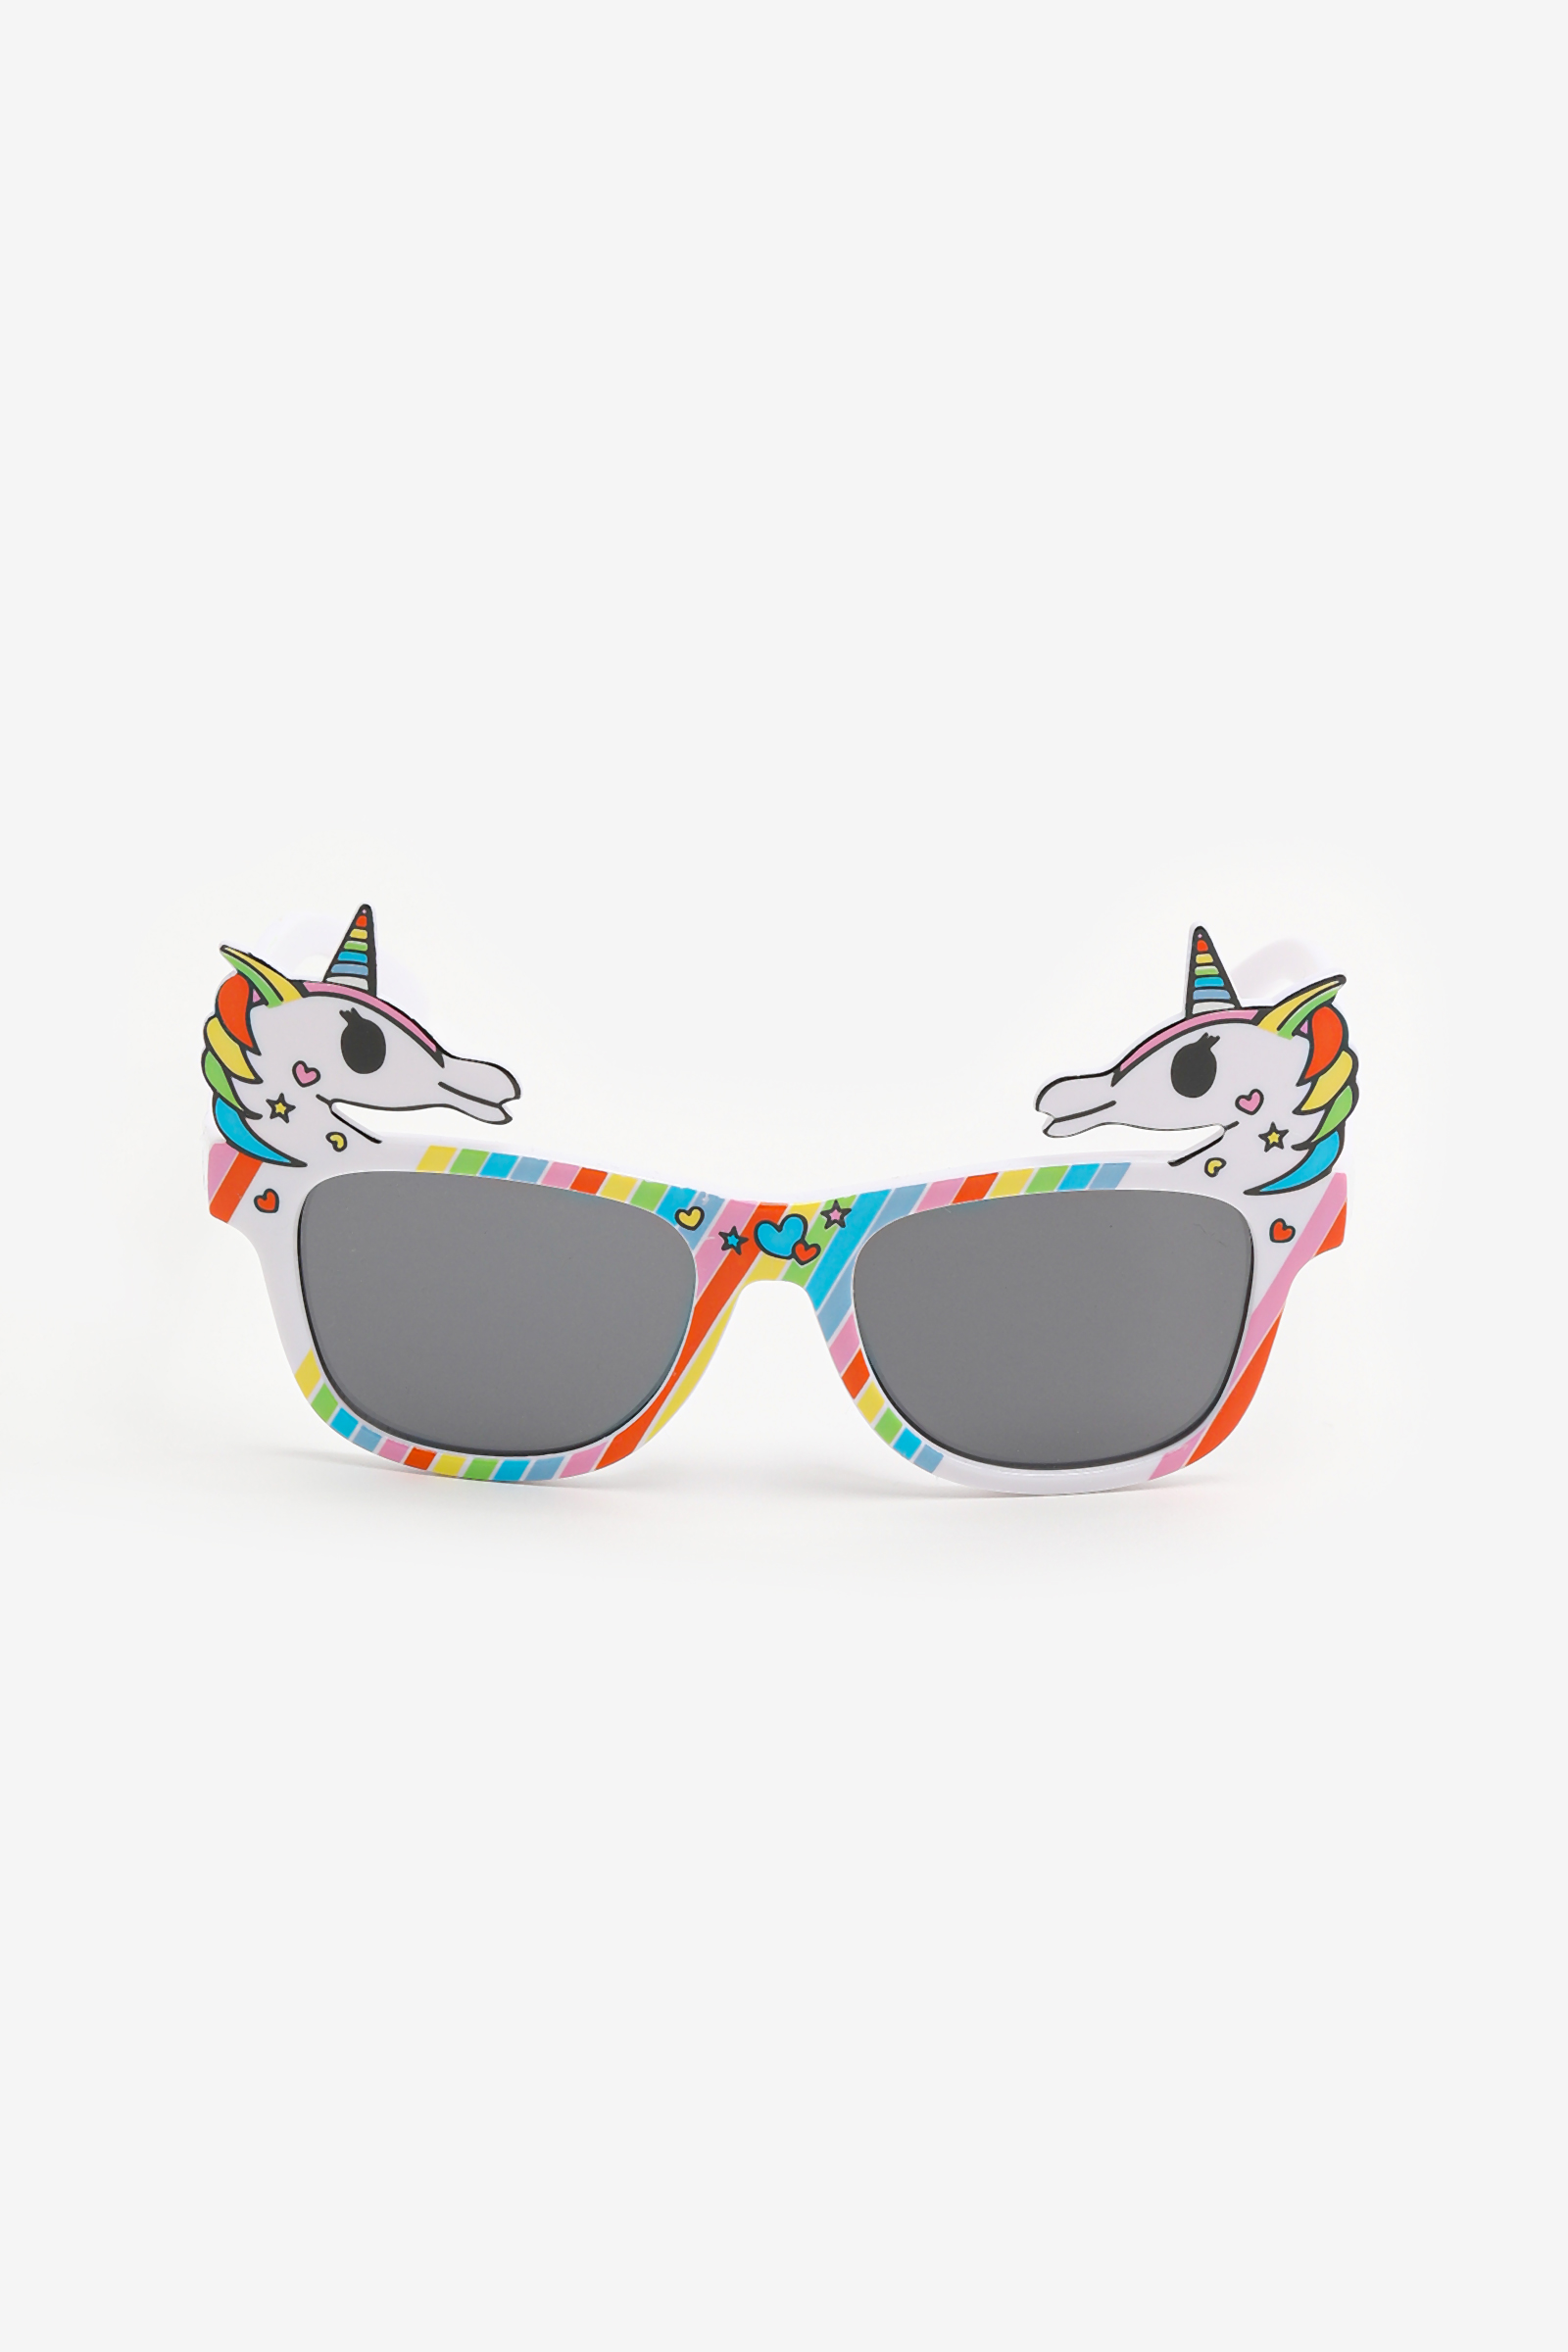 Unicorn Sunglasses for Kids